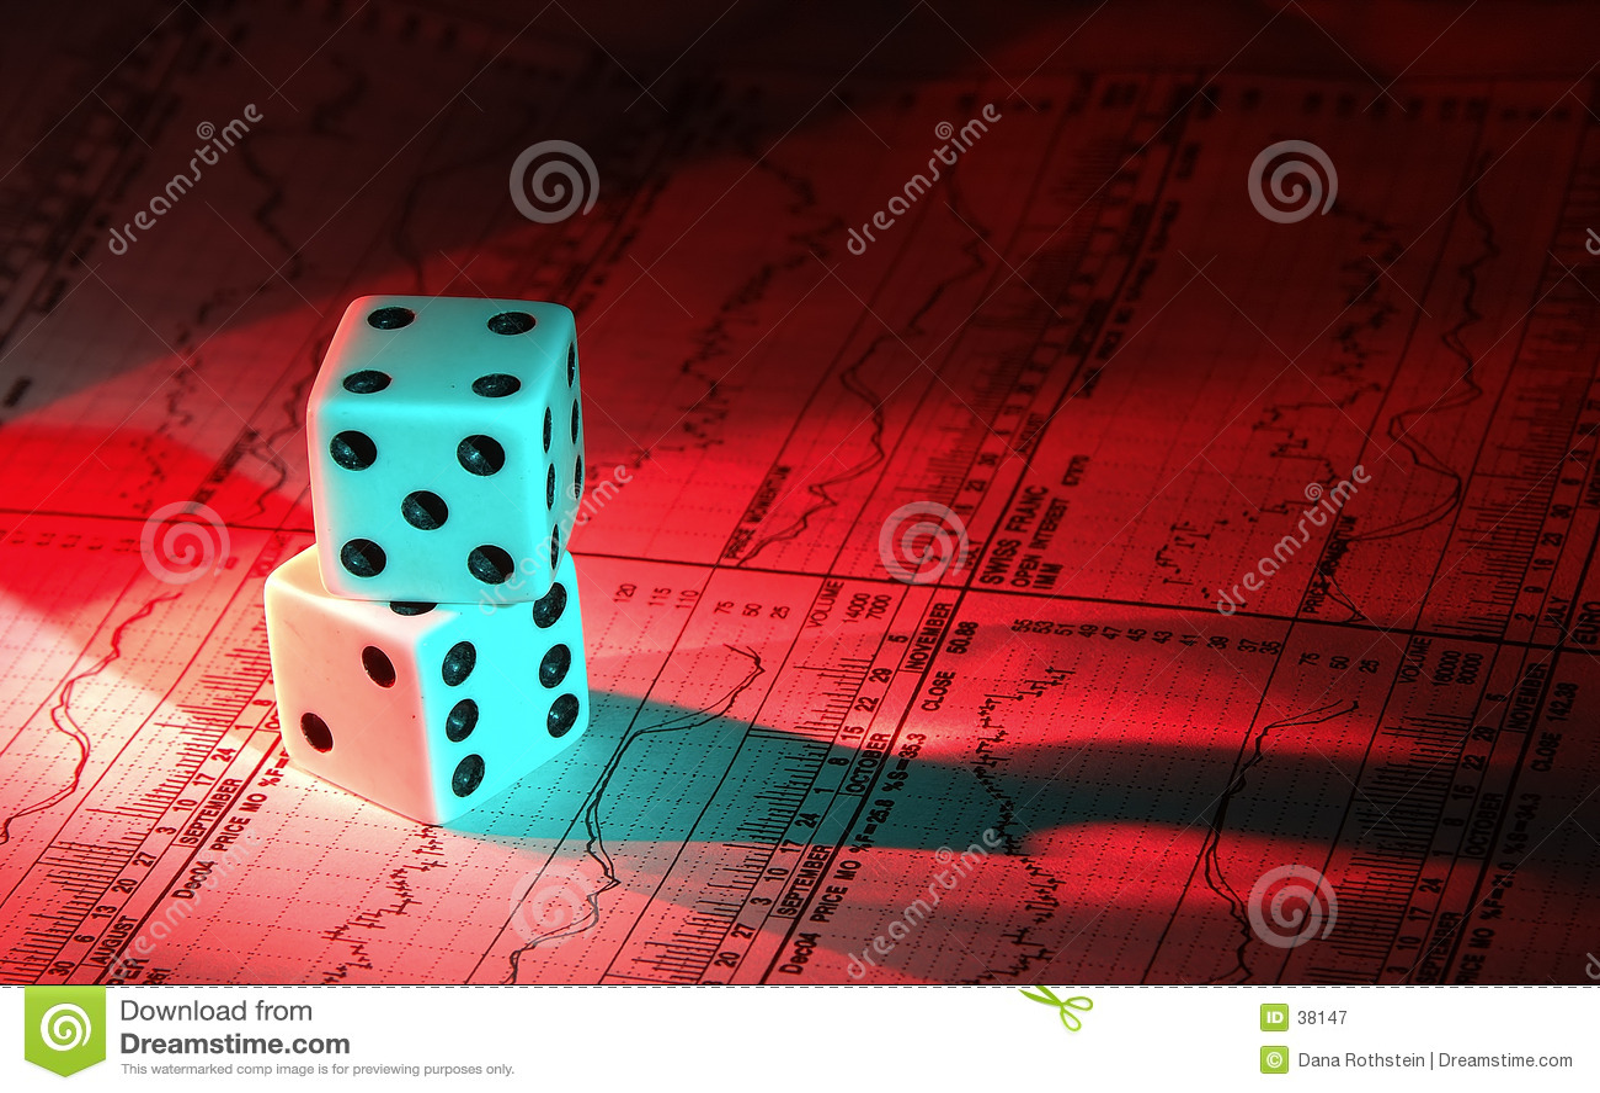 Investment Gamble 2